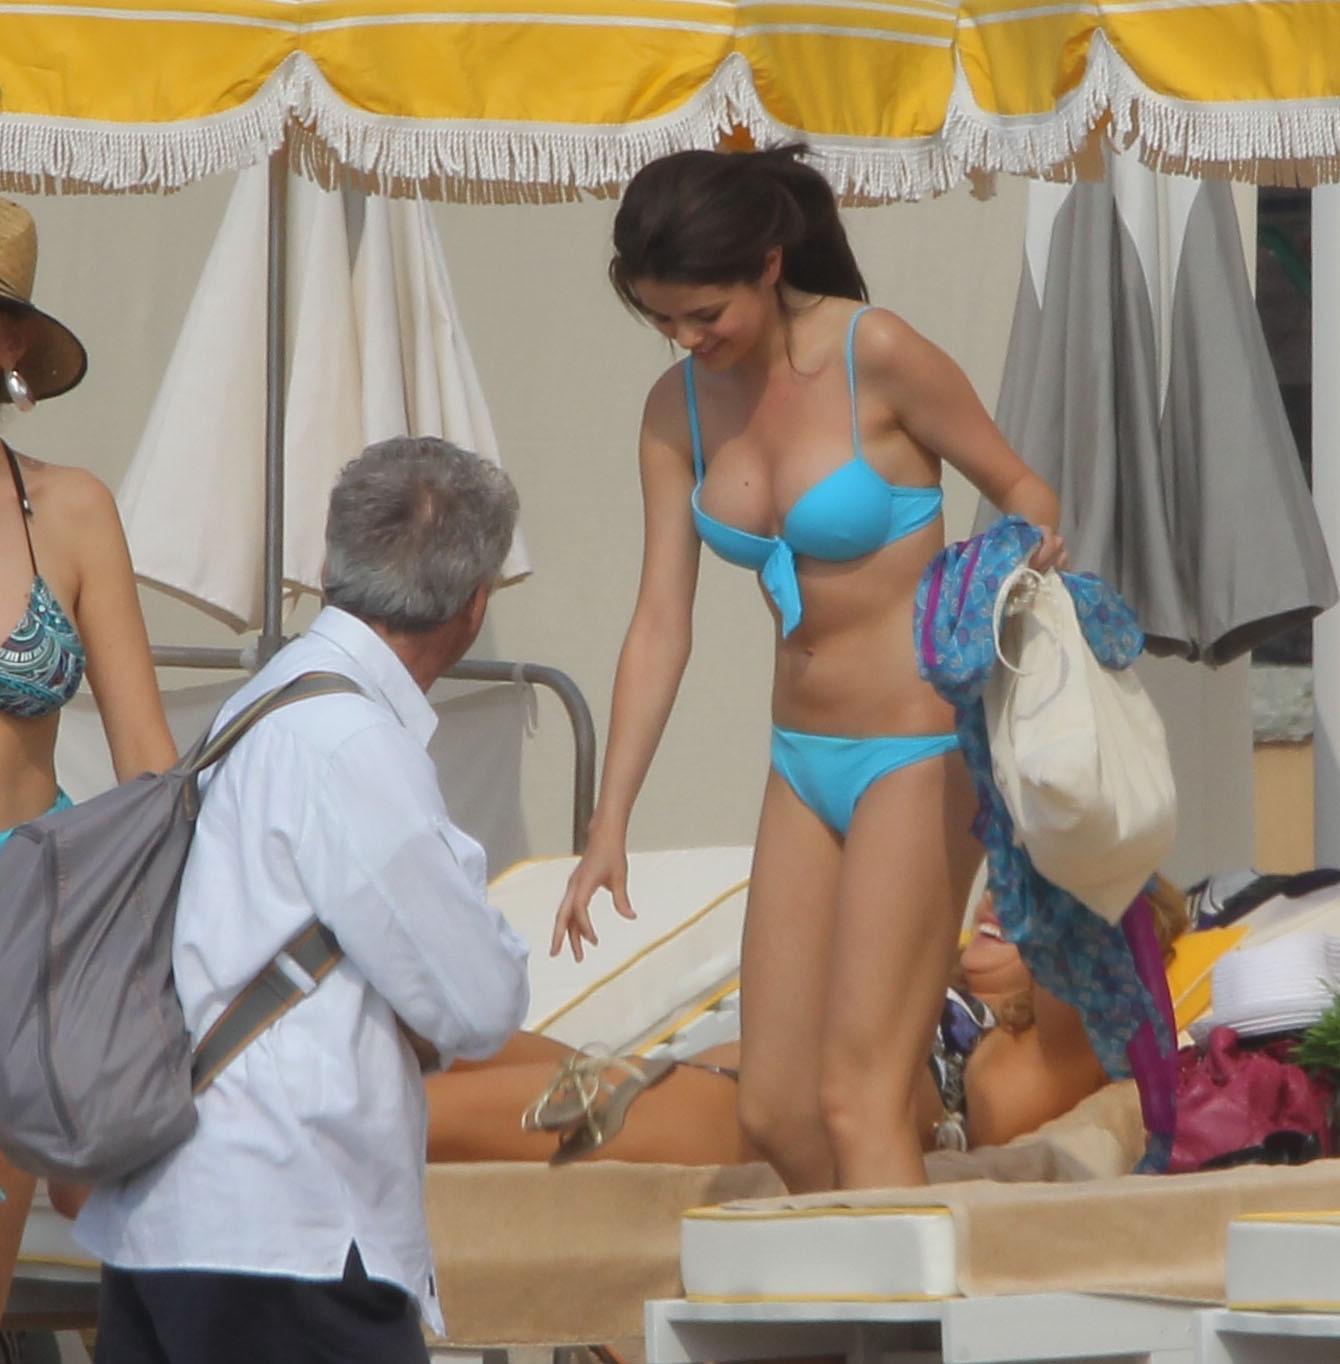 http://1.bp.blogspot.com/_fOII23LhBgA/TOTXZI1giQI/AAAAAAAAB3w/A6az3D-cmSU/s1600/04756_selena_gomez_bikini_monte_carlo_1_122_132lo.jpg